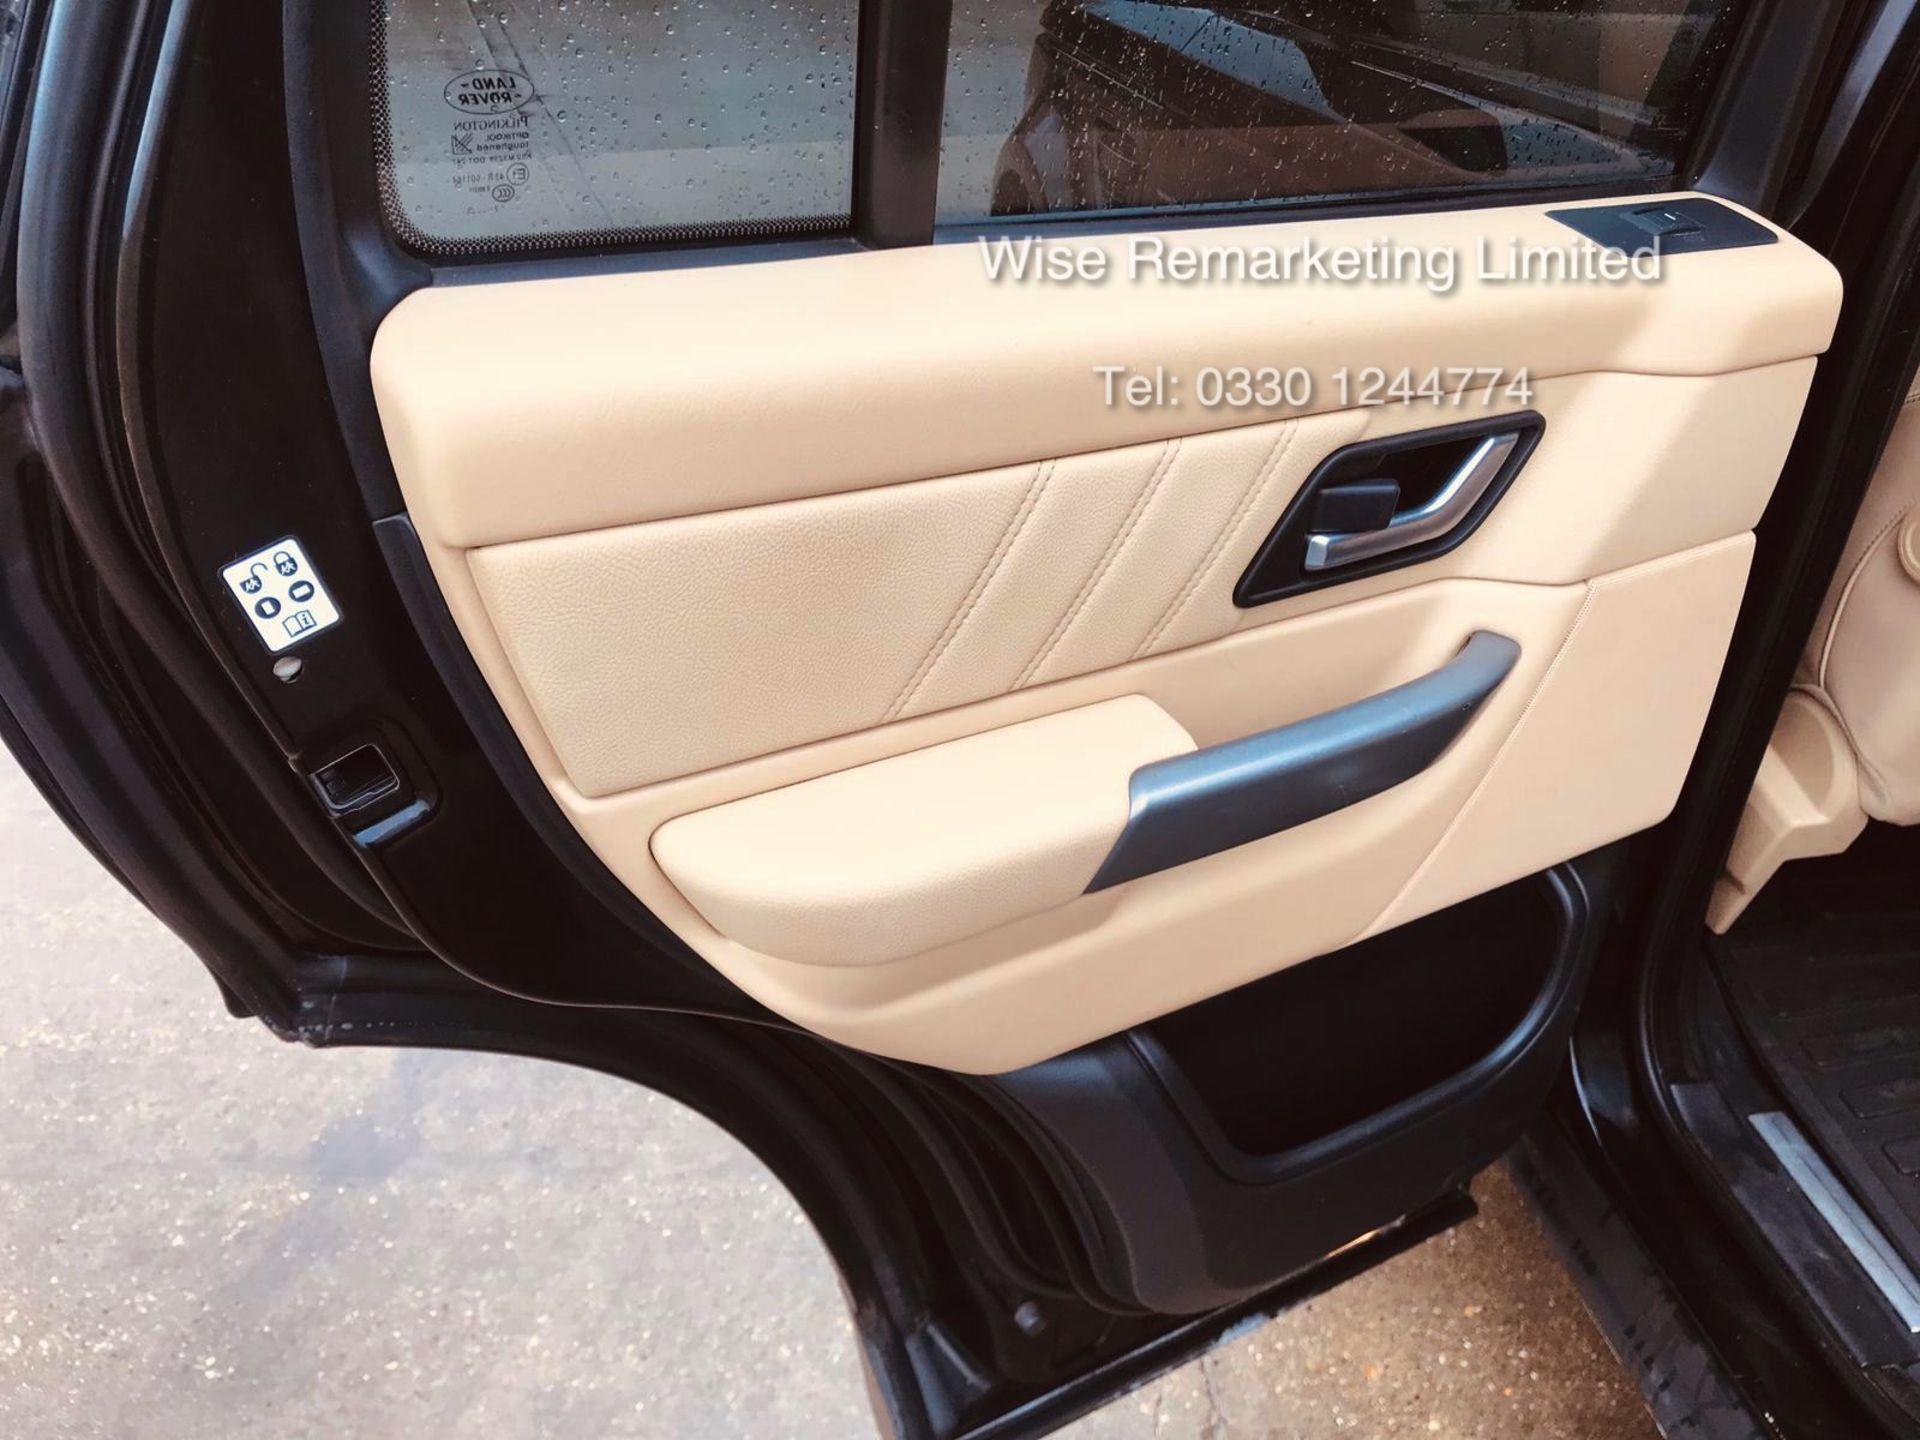 Range Rover Sport 2.7 TDV6 HSE Auto - 2008 Model - Cream Leather - Sat Nav - Heated Seats - Image 14 of 19